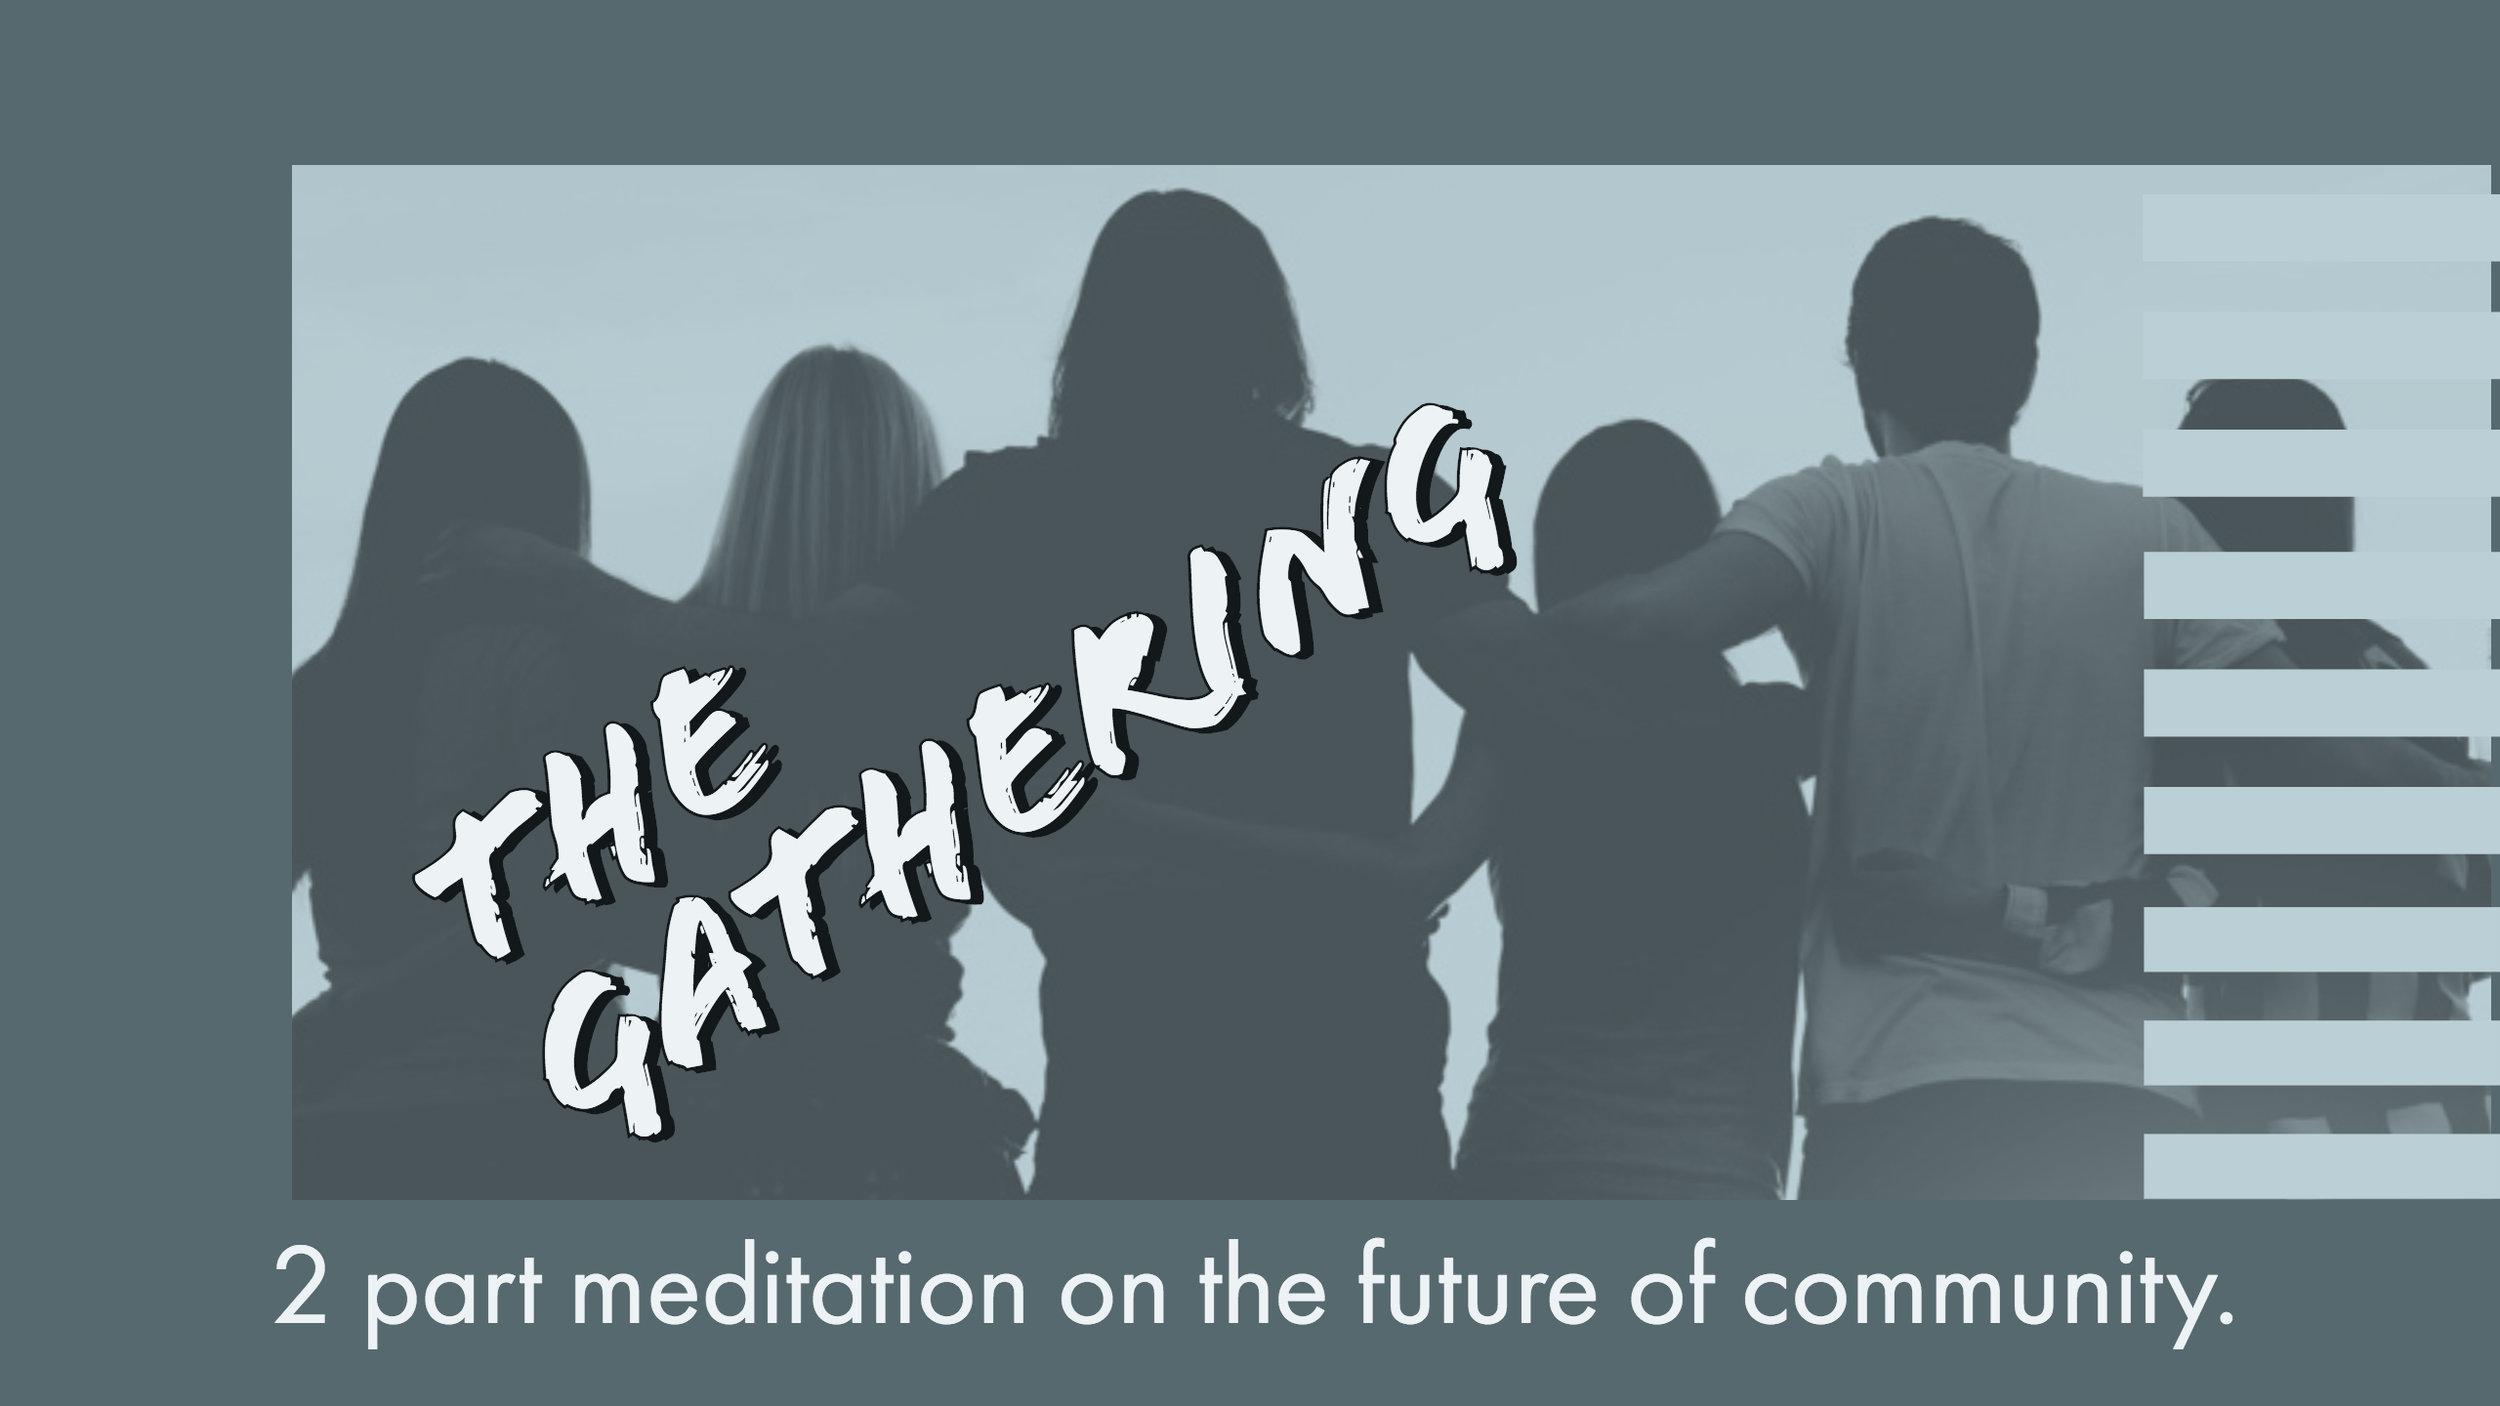 The Gathering Pt 1 - Robert Frazier